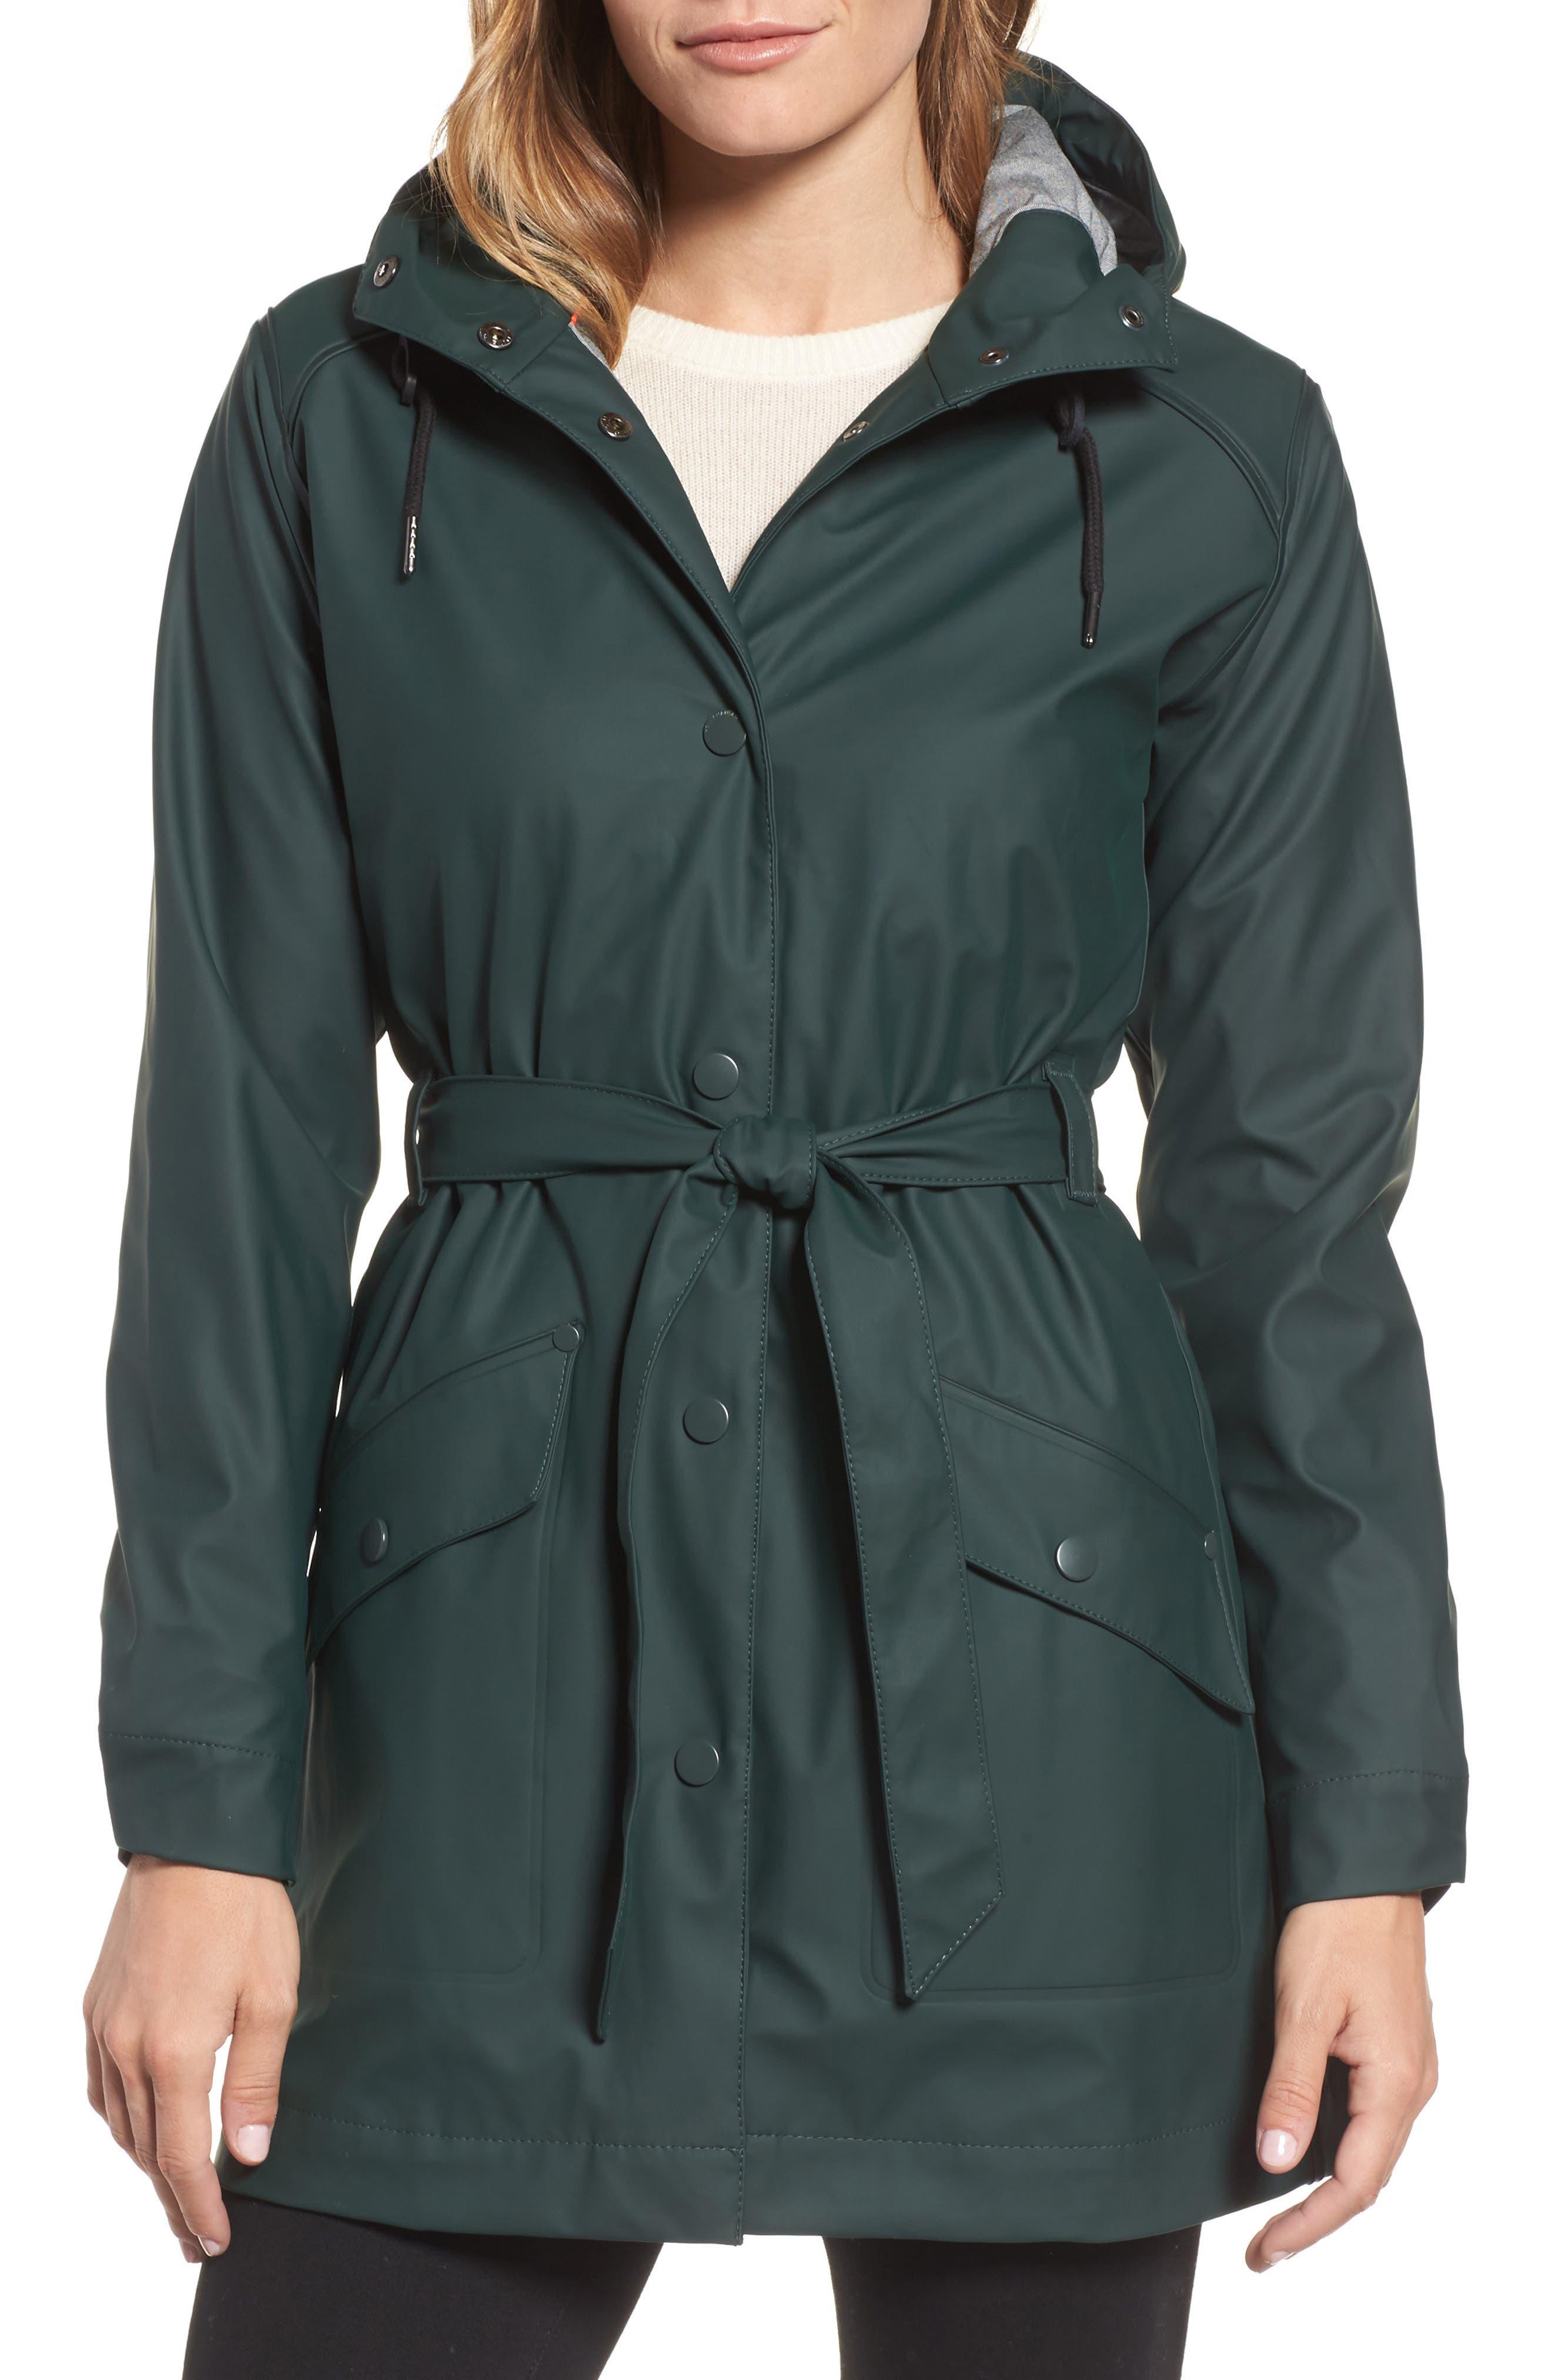 Kirkwall Raincoat,                         Main,                         color, Darkest Spruce